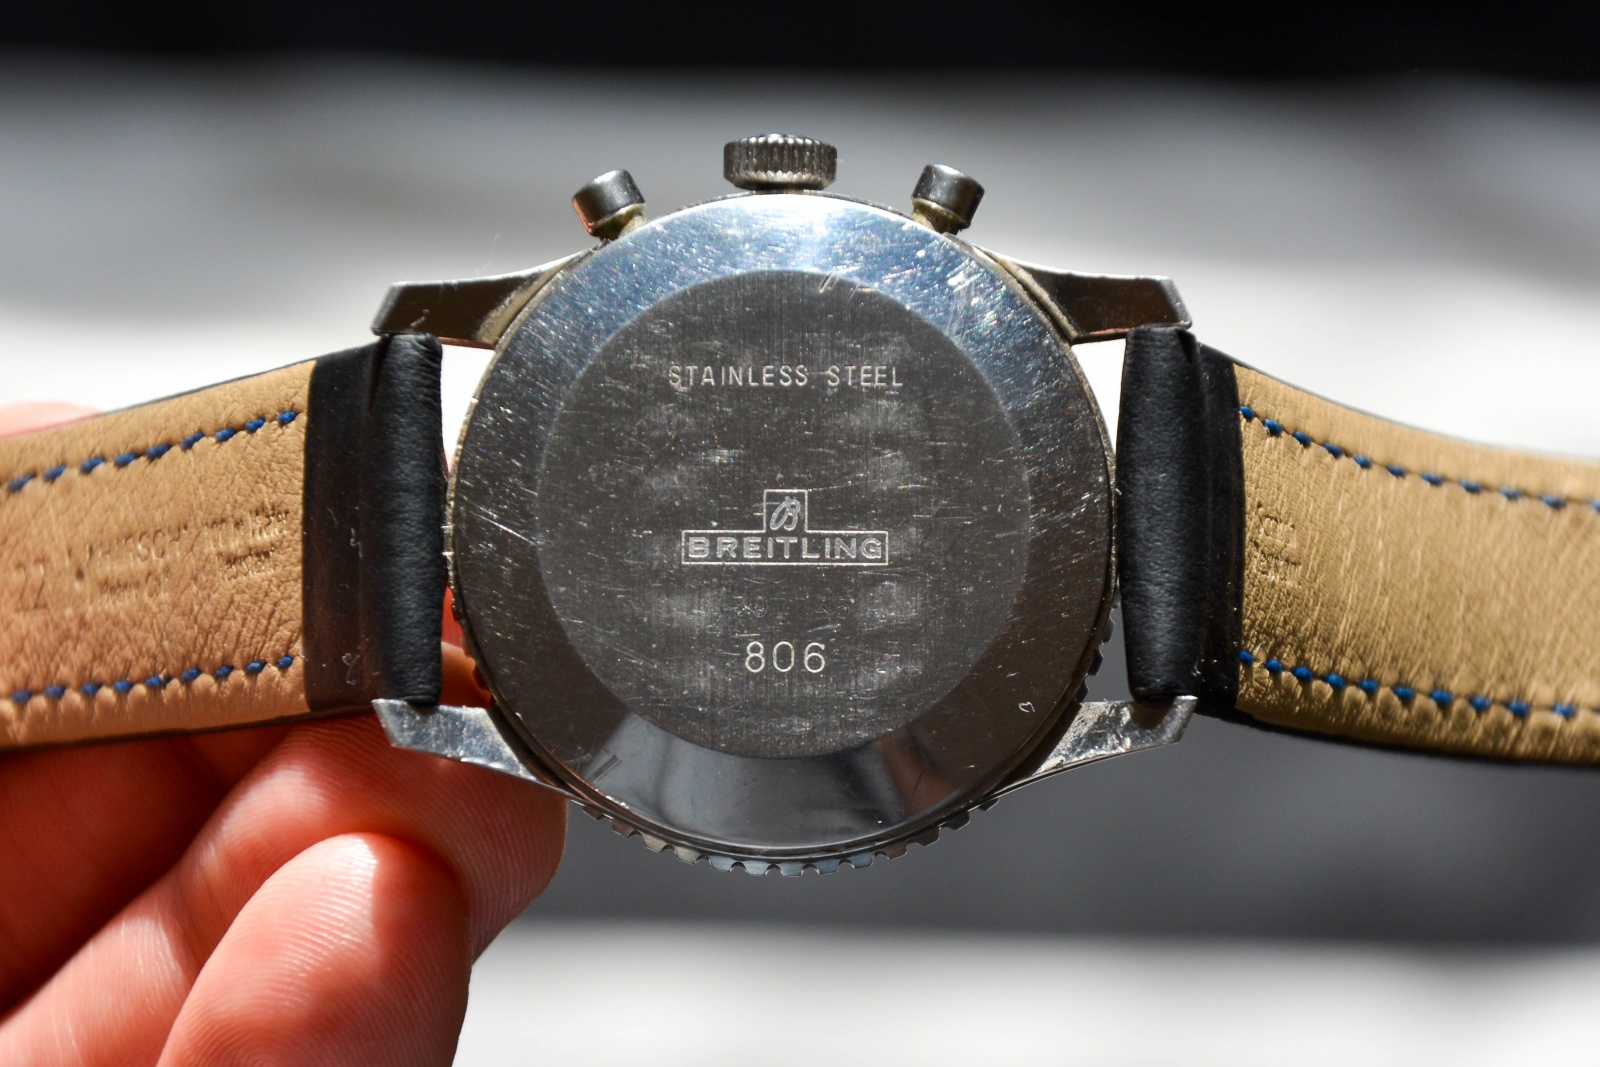 Breitling Navitimer '69 Cal. Venus 178 ref. 806